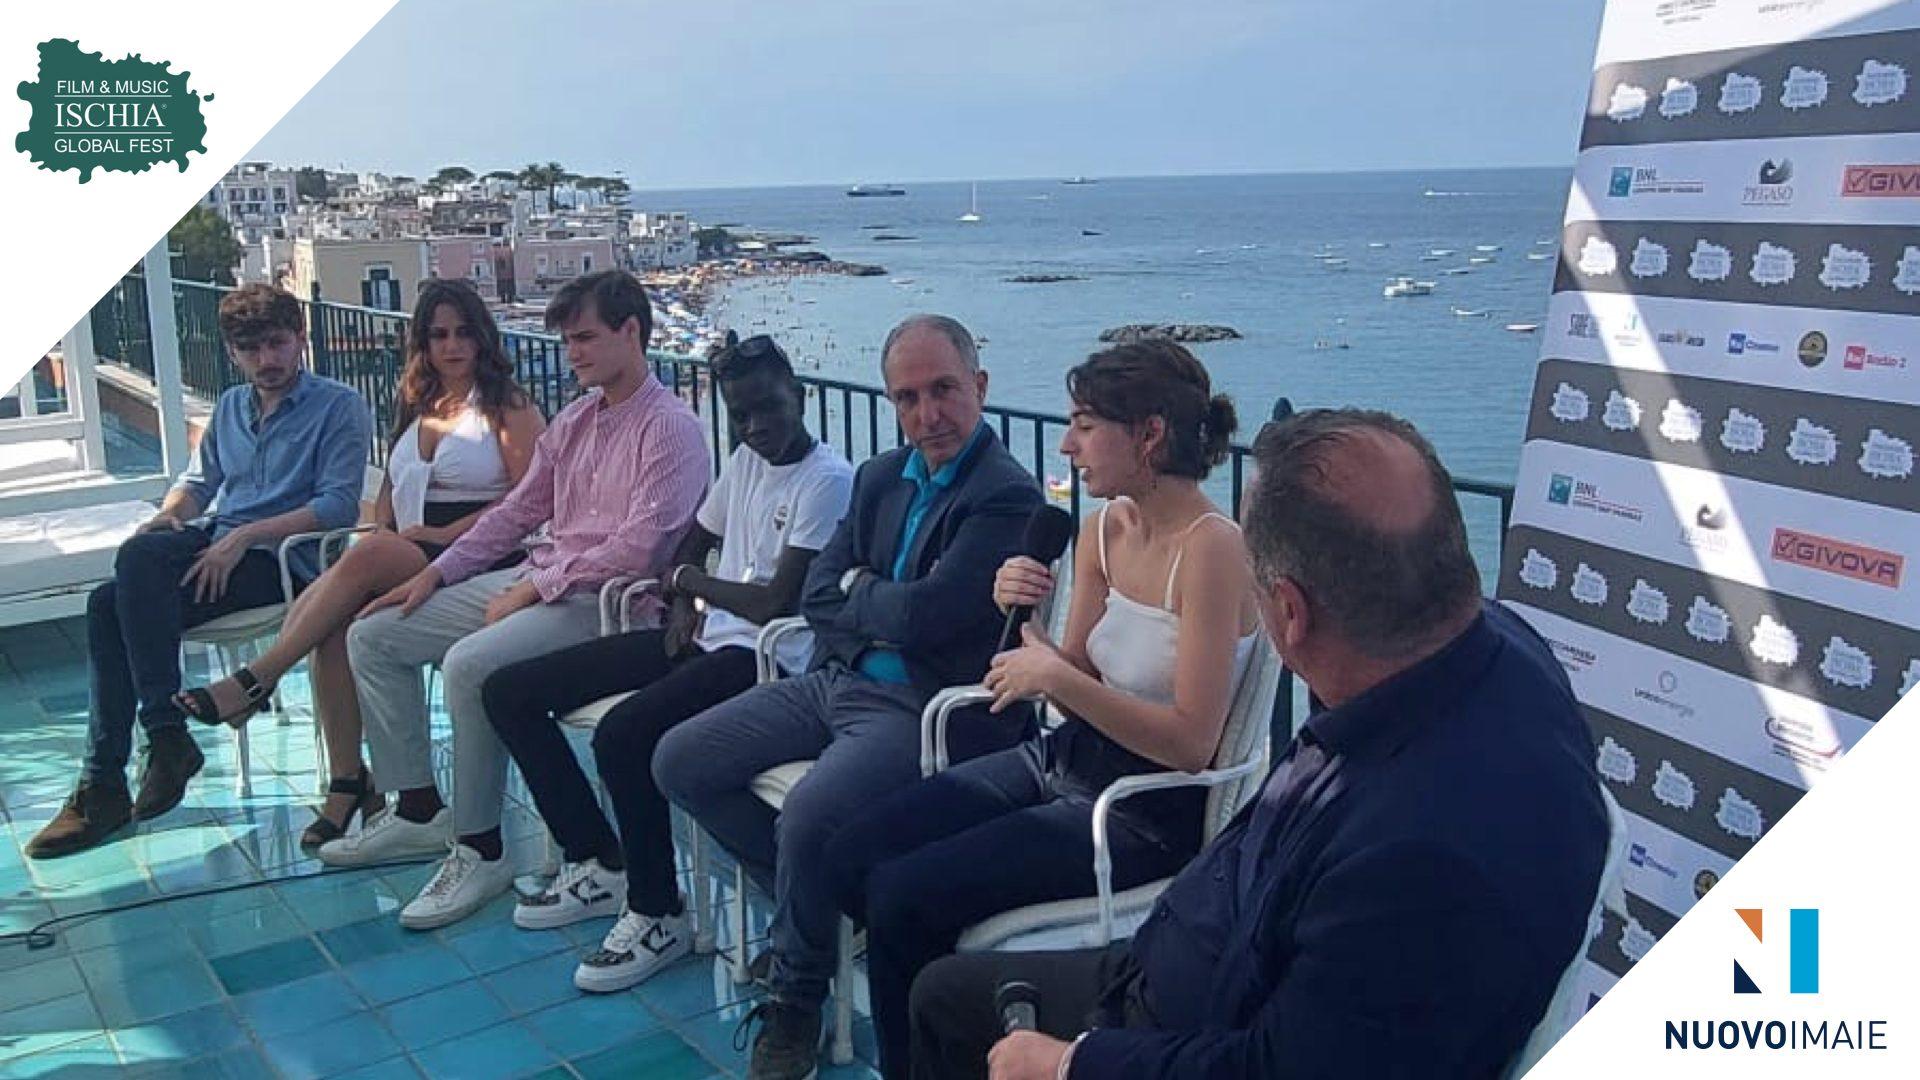 NUOVO IMAIE insieme ai giovani attori all'Ischia Global Fest